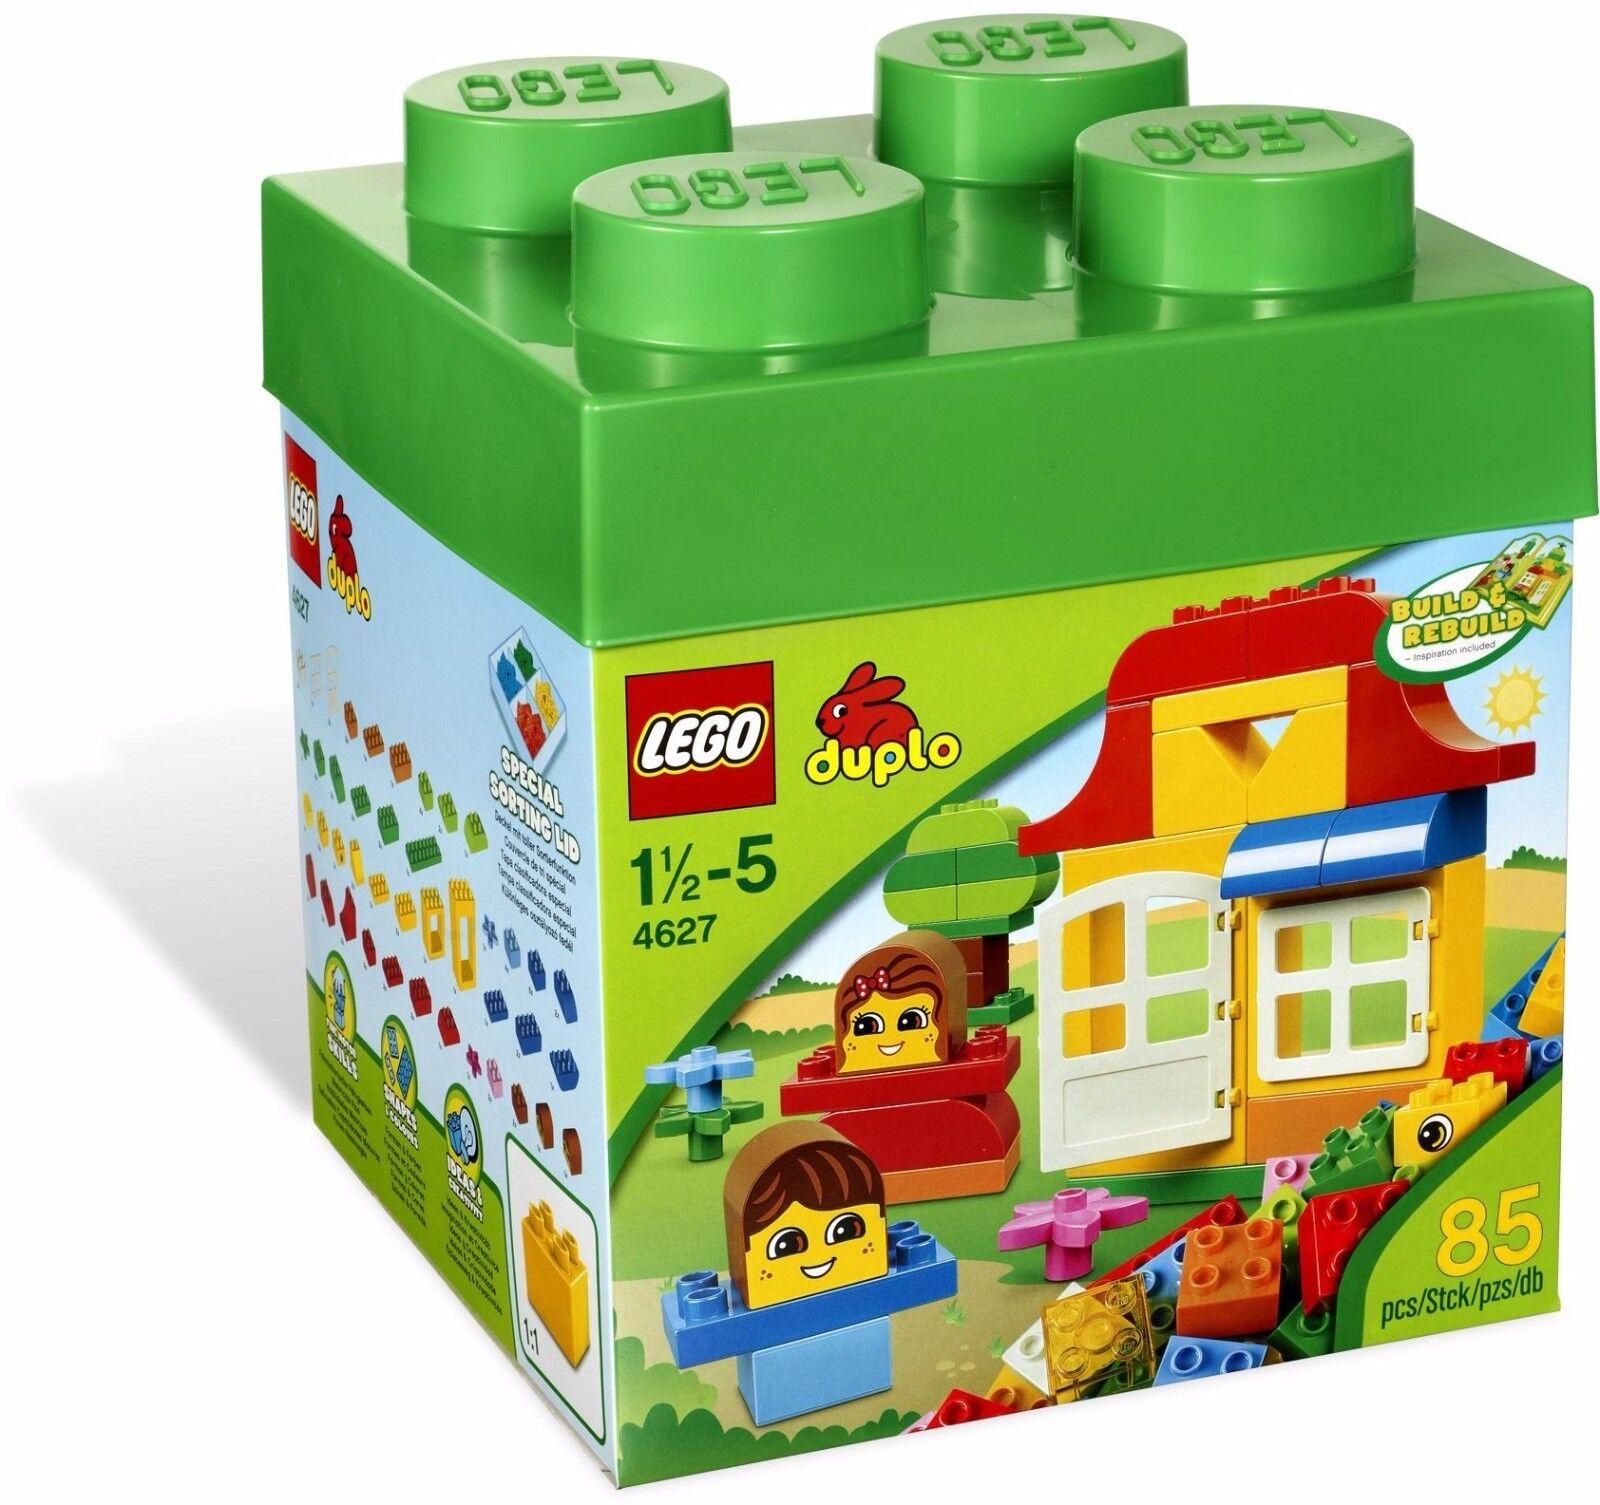 Lego Duplo Fun With Bricks 4627 For Sale Online Ebay